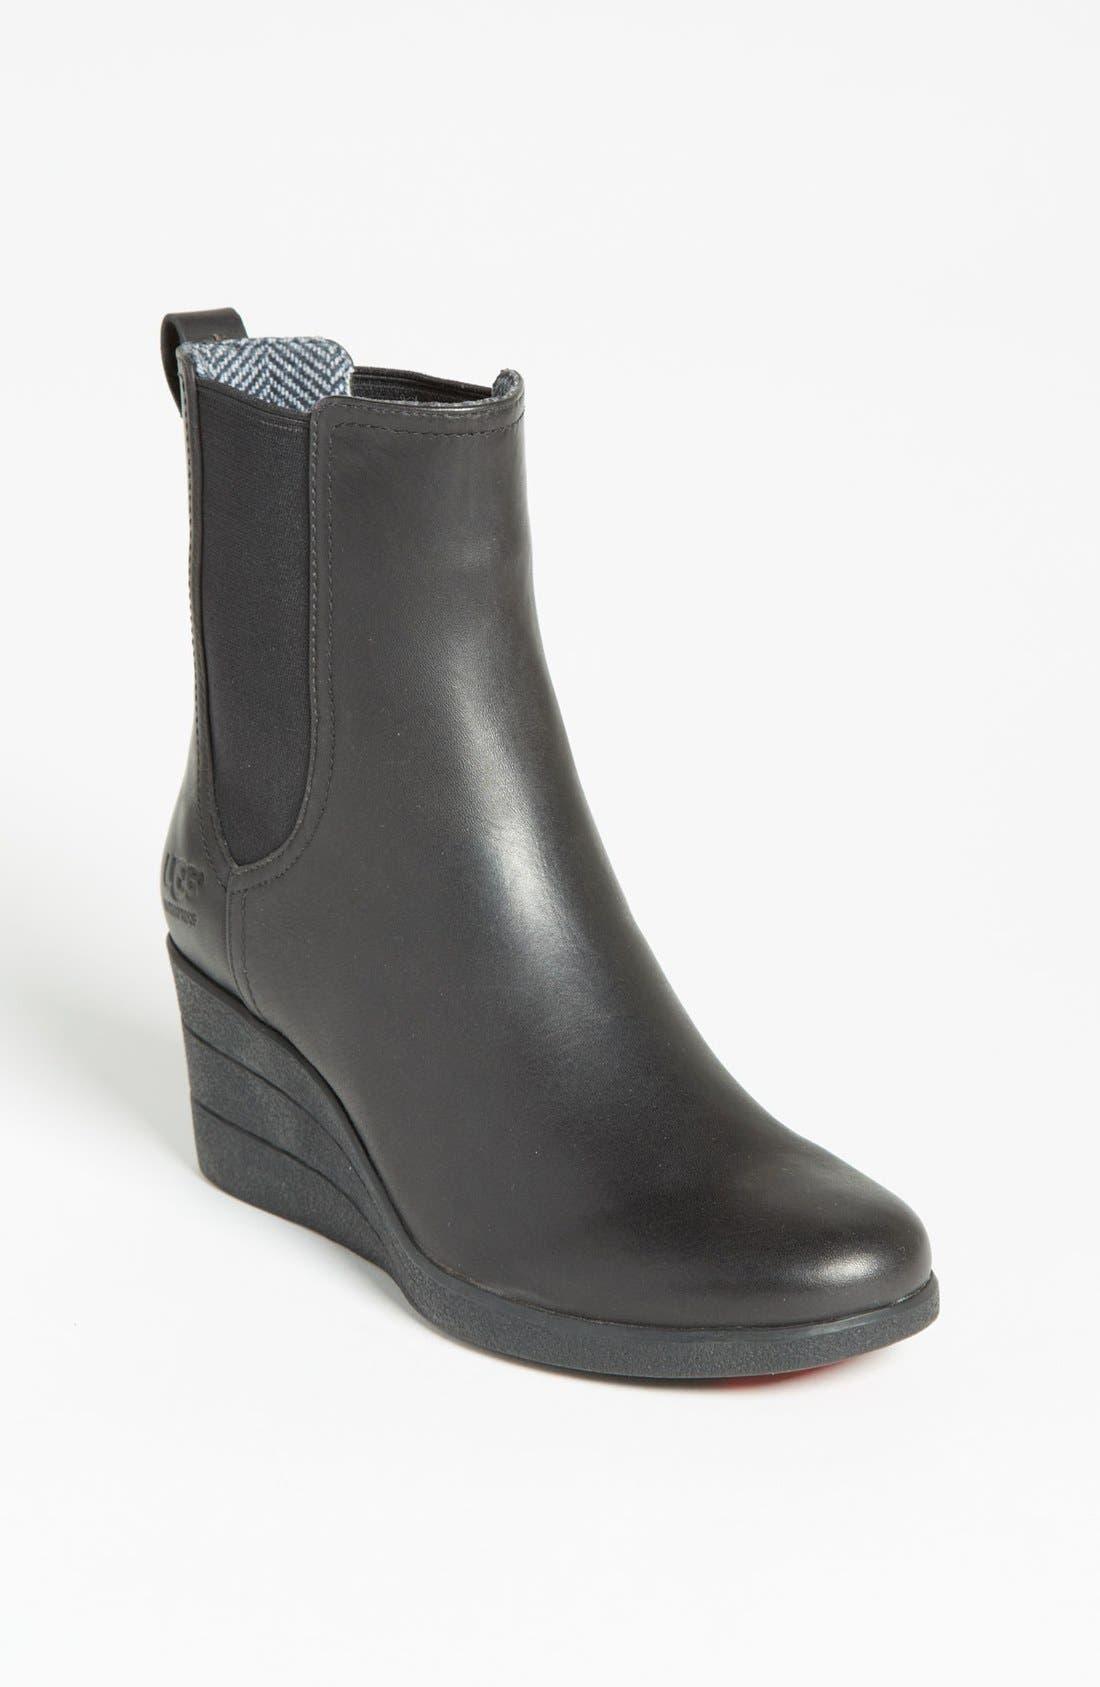 Main Image - UGG® Australia 'UGGpure™ - Dupre' Rain Boot (Women)